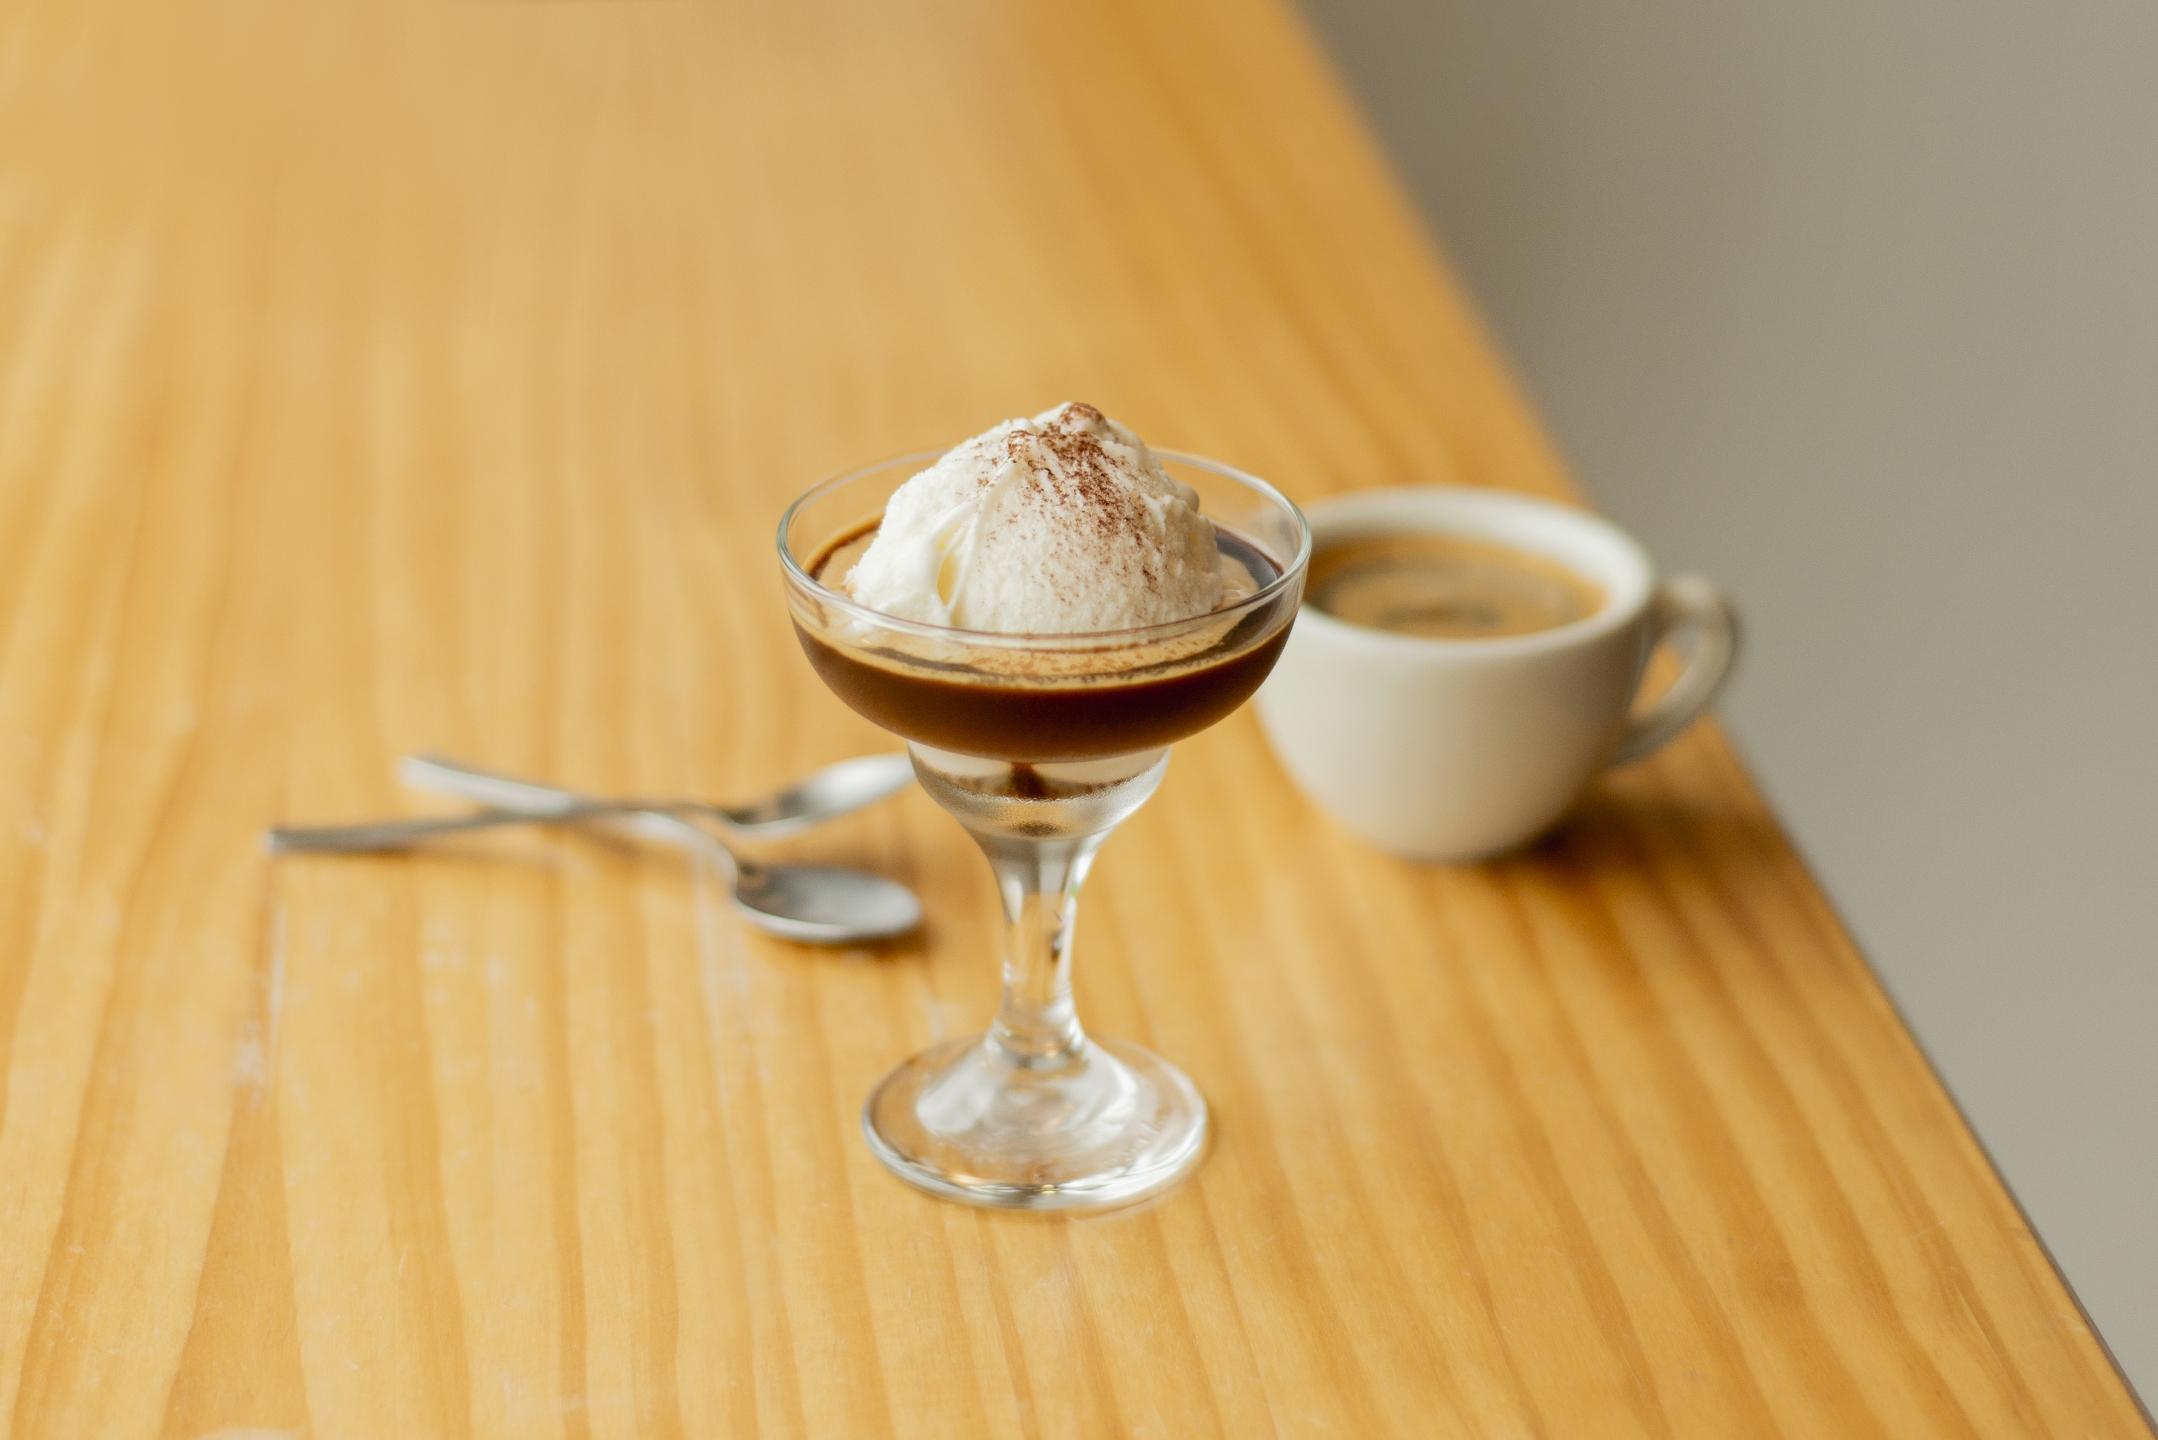 ABG Coffee,Coffee,咖啡廳,咖啡,台北咖啡廳,ALWAYS BEAN GOOD,Affogato,Espresso,冰淇淋,蜷尾家